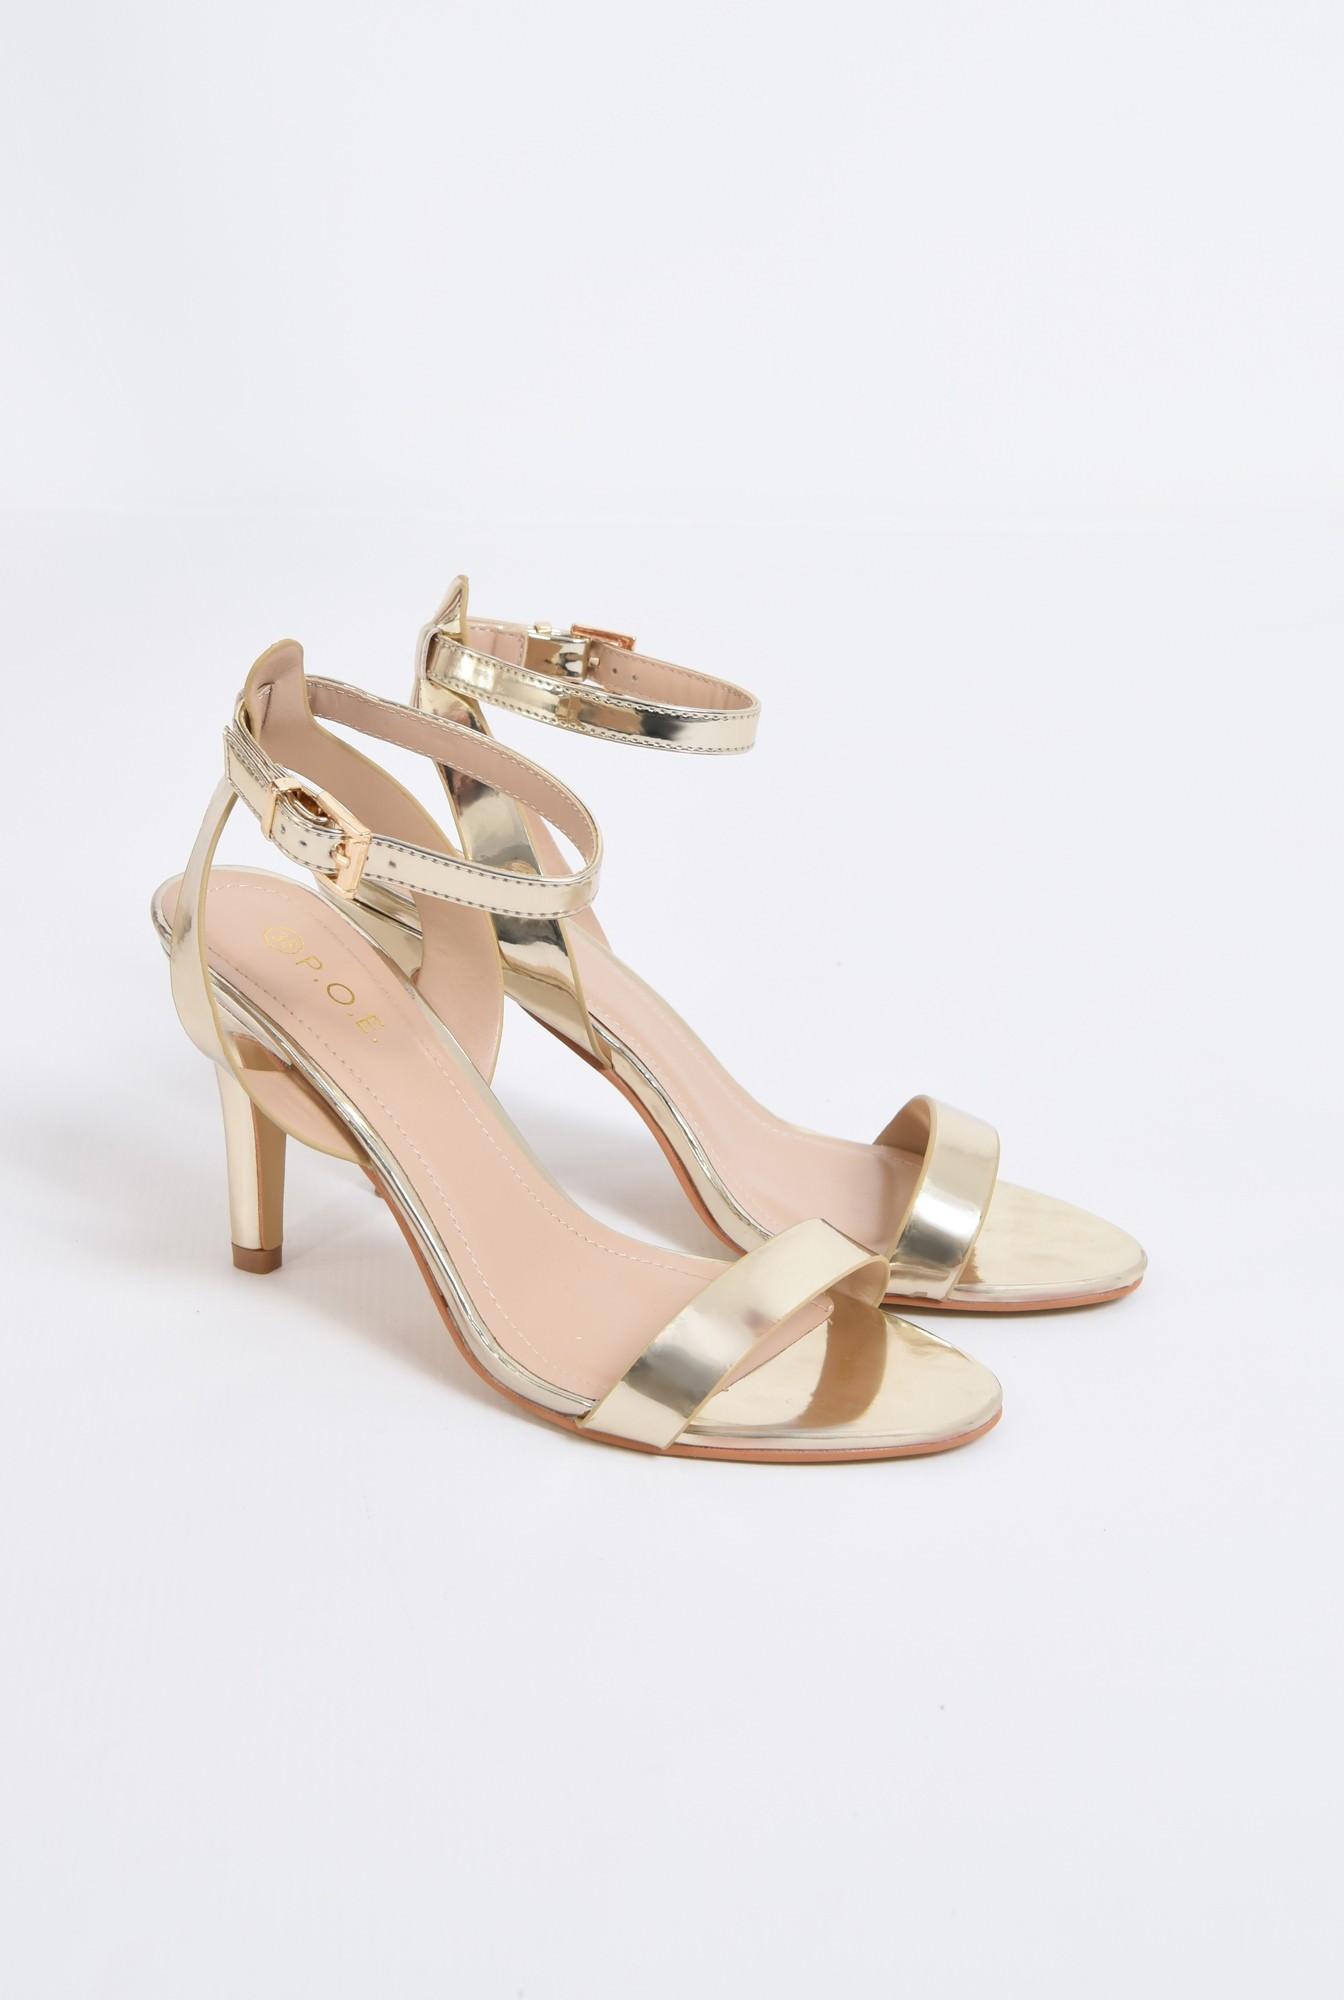 1 - sandale elegante, aurii, cu toc subtire